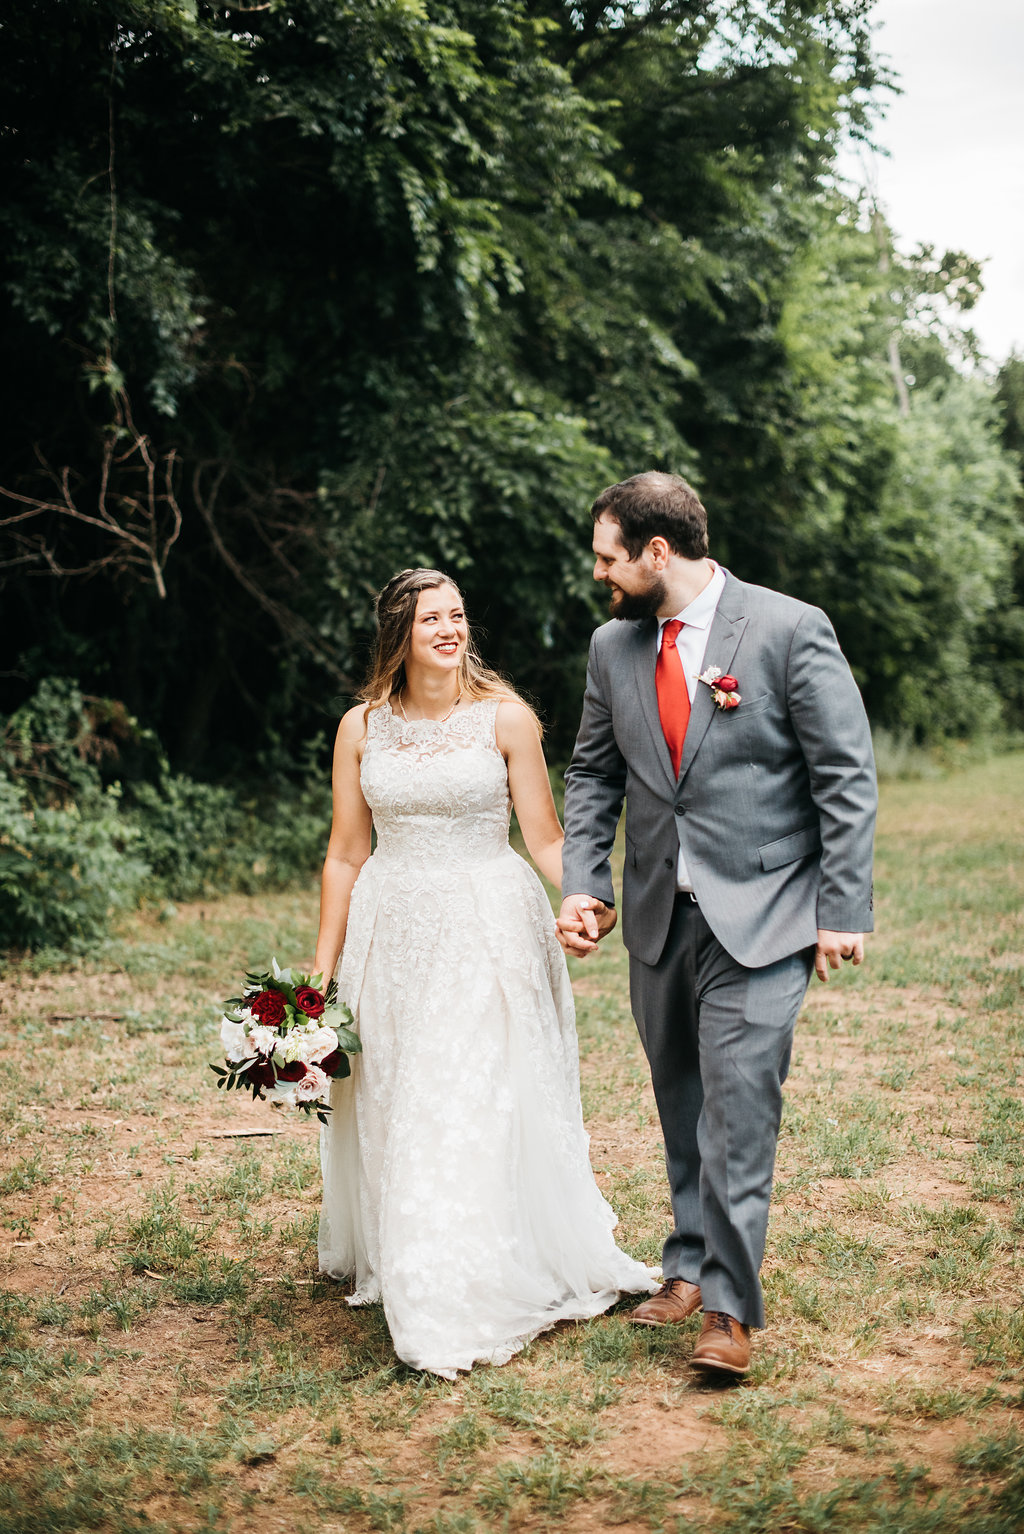 Lexi-Colby-Wedding-2834.jpg